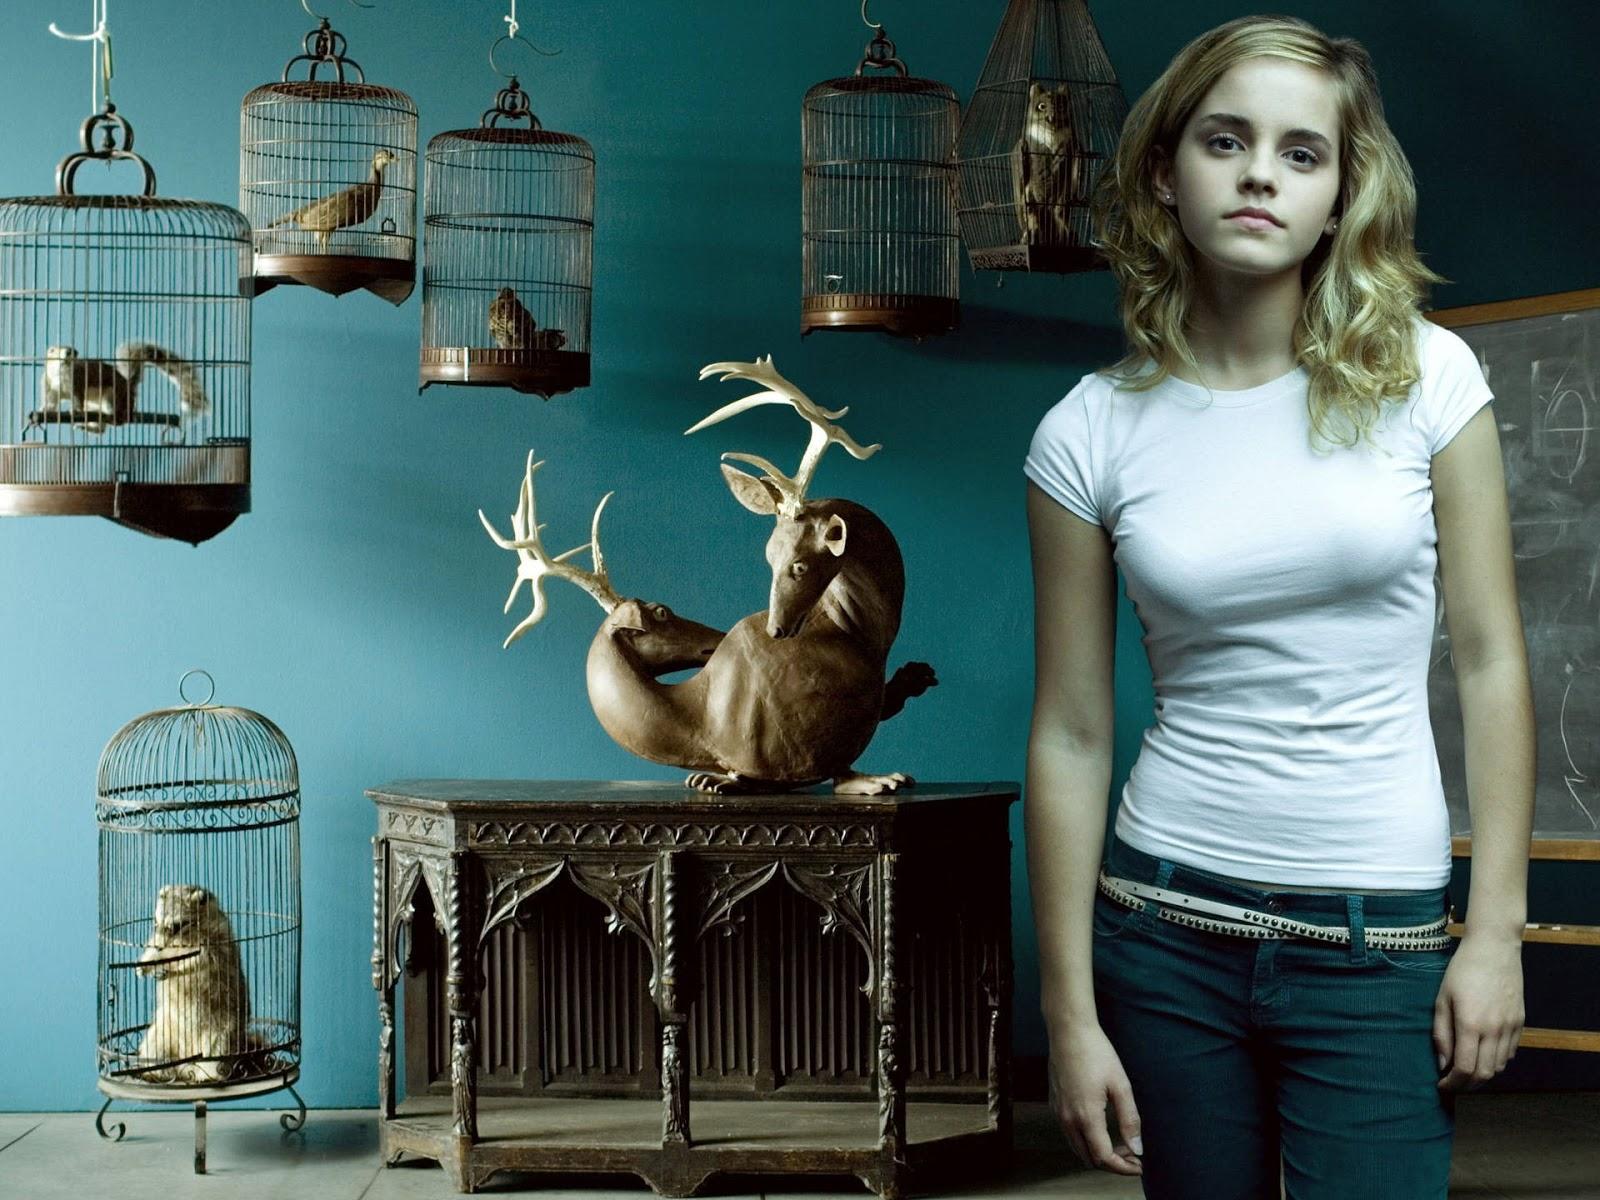 http://2.bp.blogspot.com/-lTfPrYW8Xpg/UKDCnEHuKHI/AAAAAAAAAQ8/z7CPxHWM4LY/s1600/Emma-Watson-Widescreen-Wallpaper.jpg